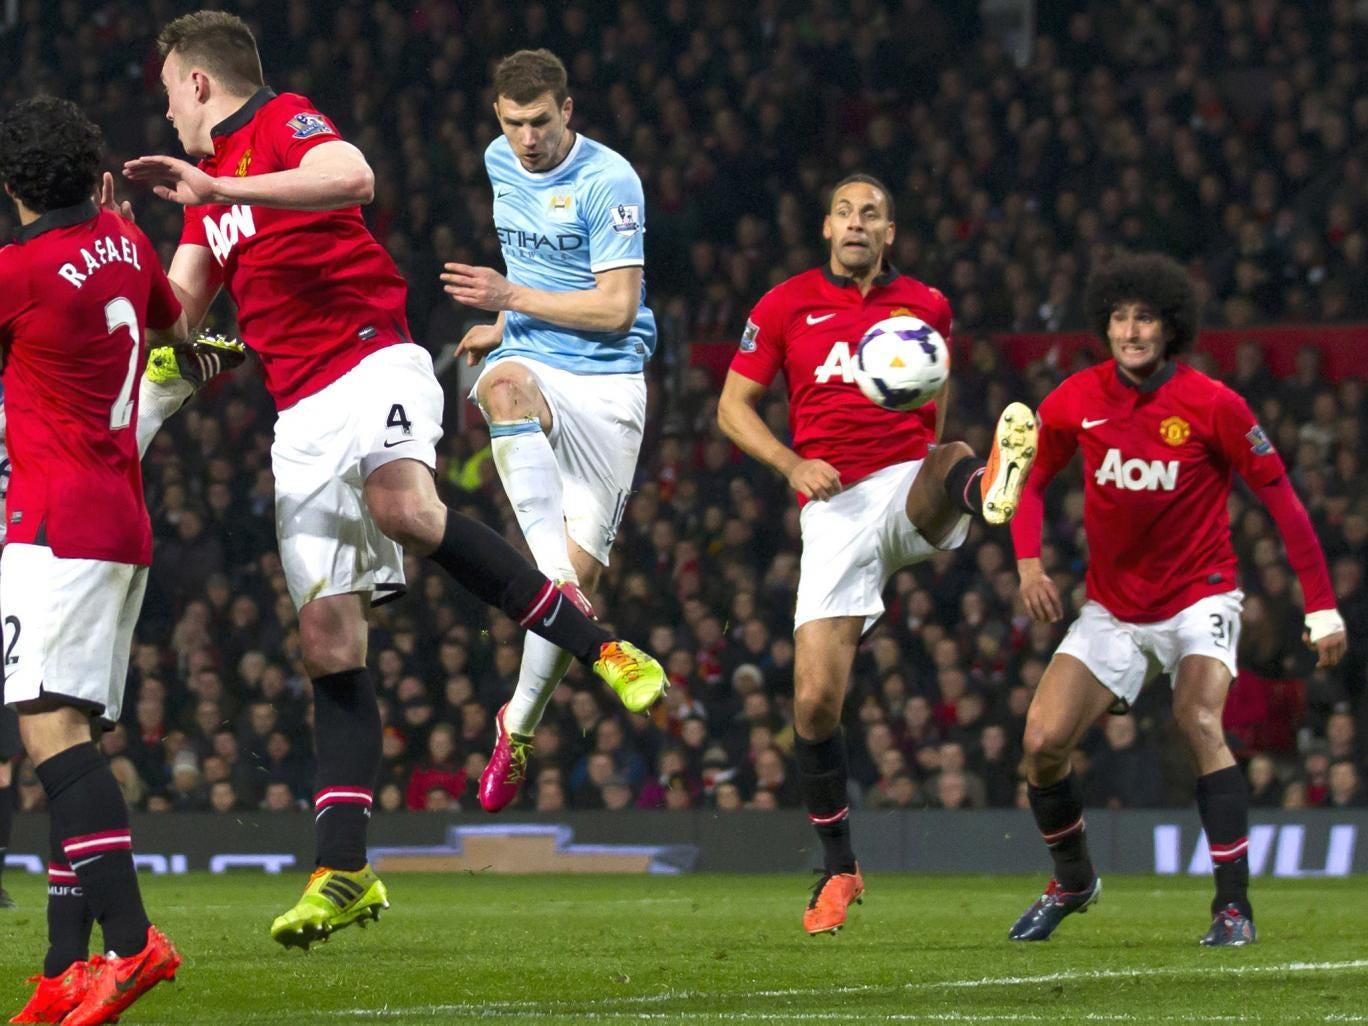 Edin Dzeko turns in his, and City's, second goal